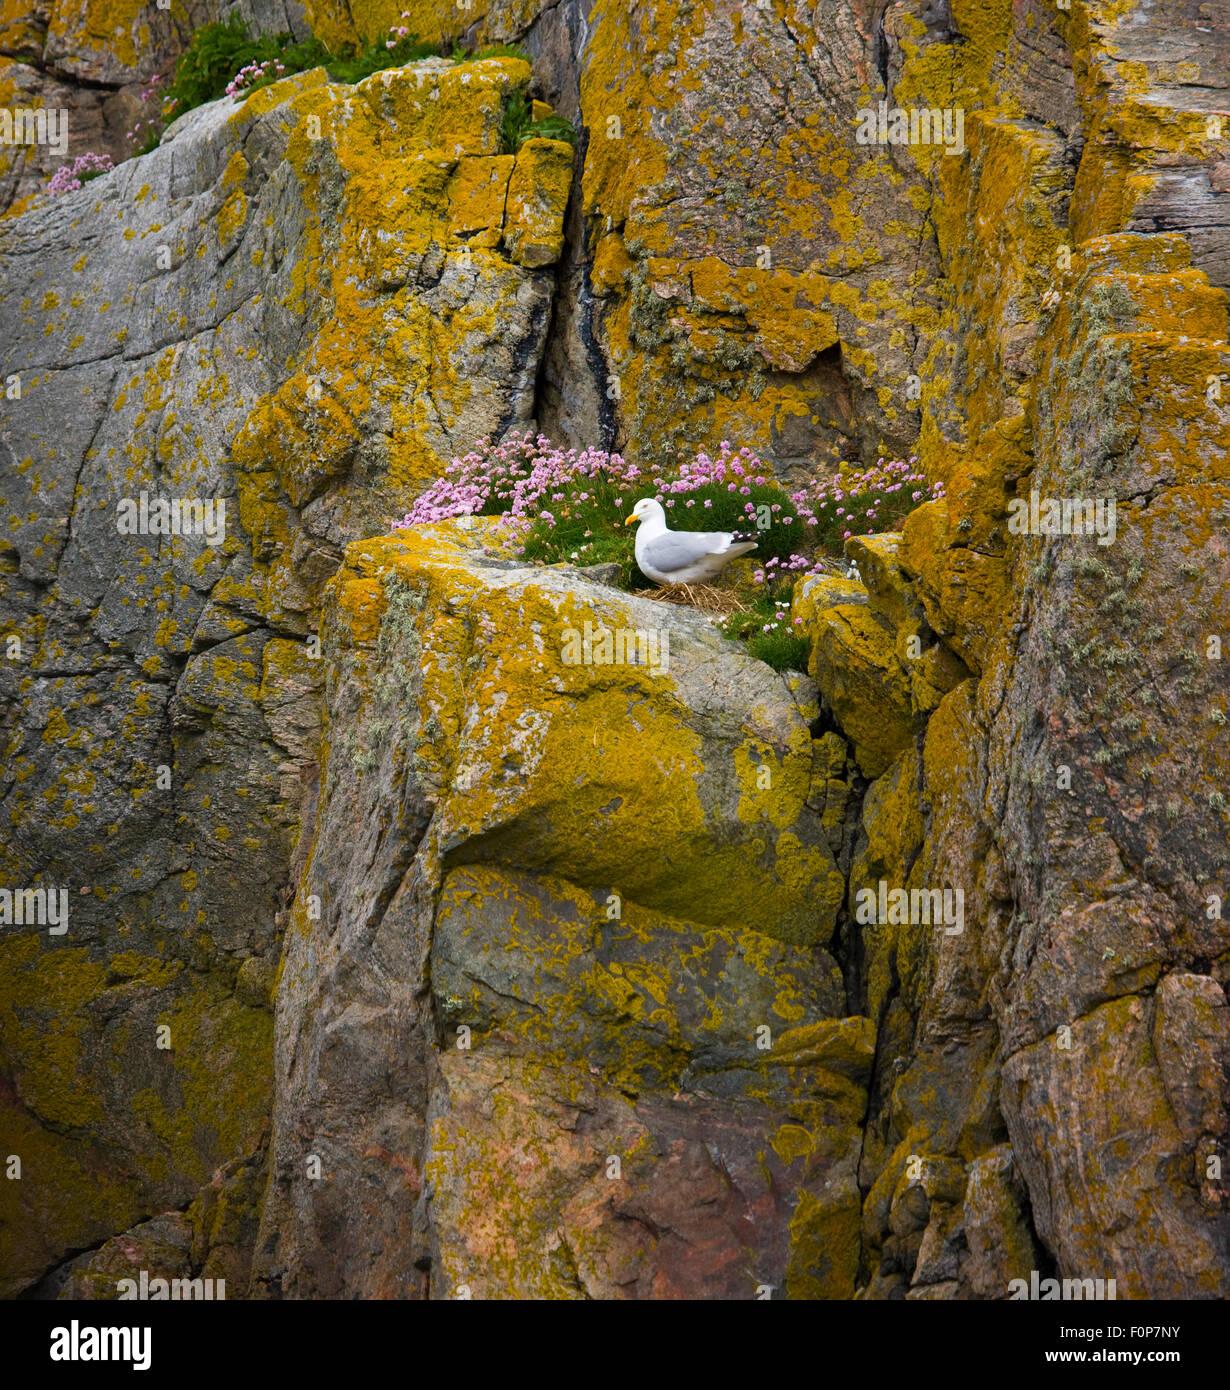 Herring gull (Larus argentatus) on nest, Great Bernera, Lewis, Outer Hebrides, Scotland, UK, June 2009 - Stock Image